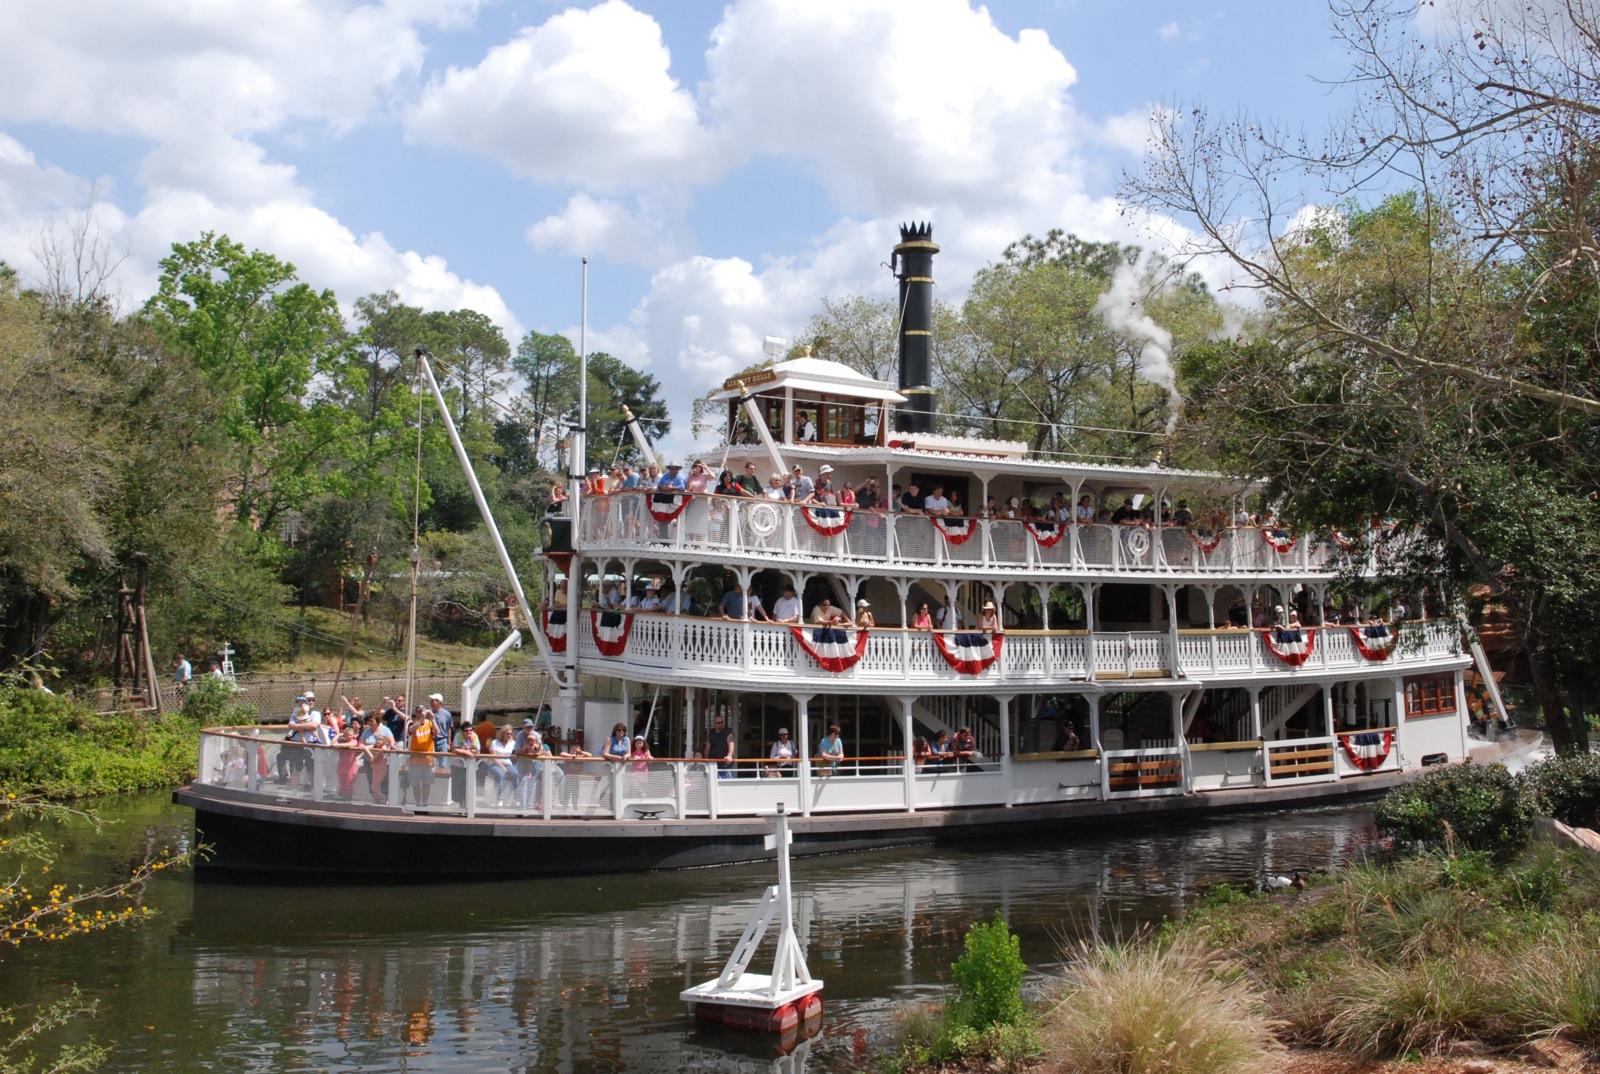 File:Liberty Belle Riverboat by hyku.jpg - Wikimedia Commons